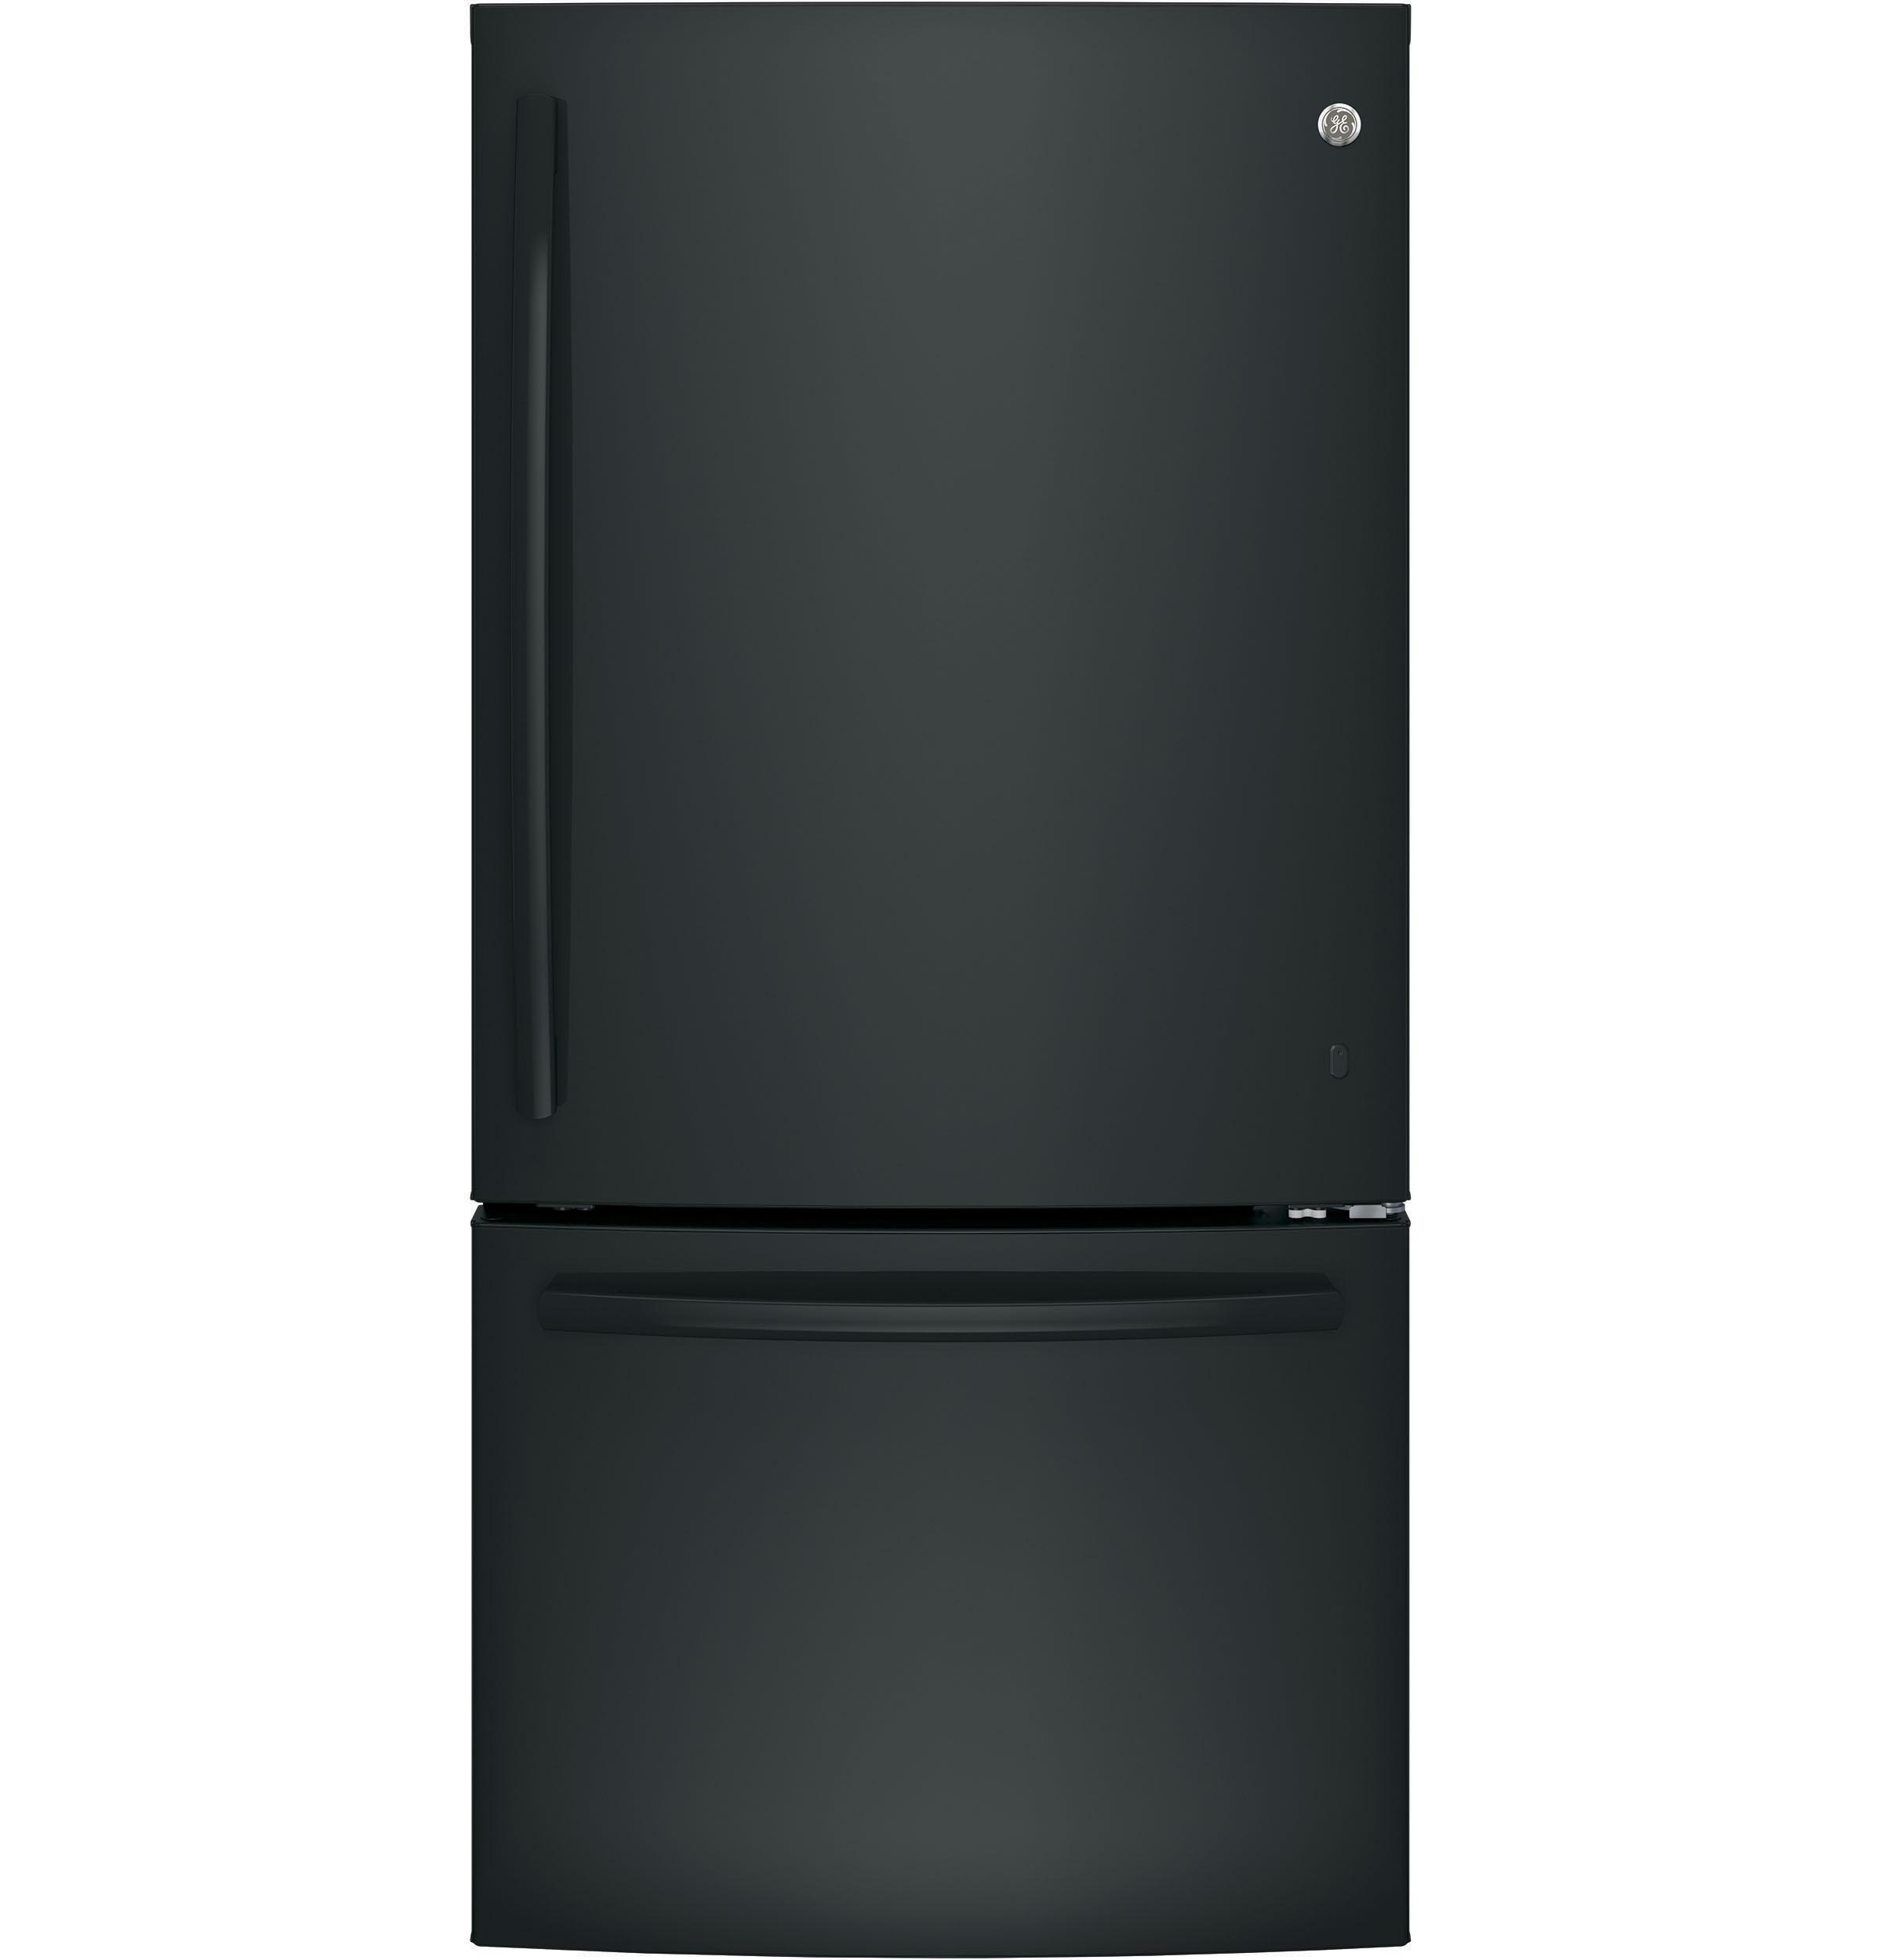 Ge refrigerator Model 25 manual on